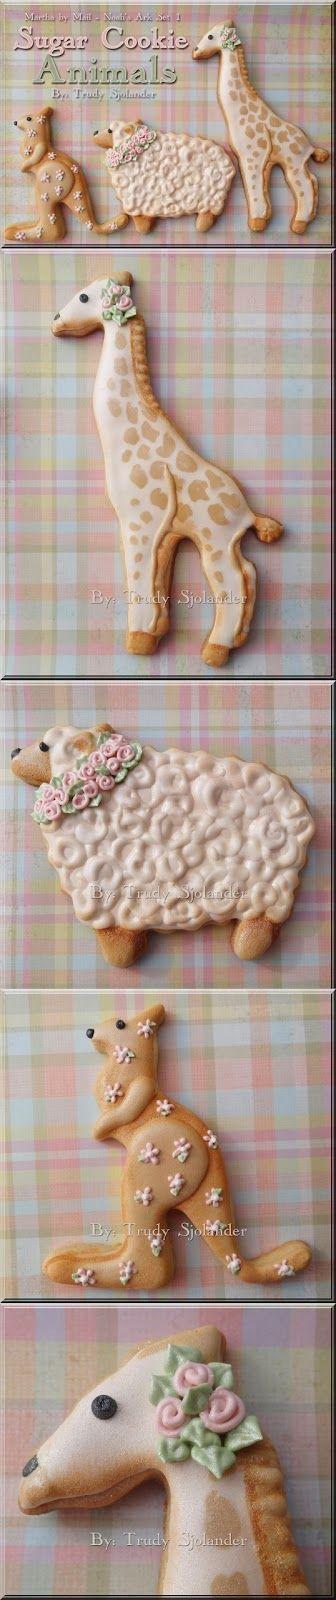 Noahs Ark Cookies~       By True's Gifts From The Heart,   Amazing cookies! Lamb, giraffe, kangaroo